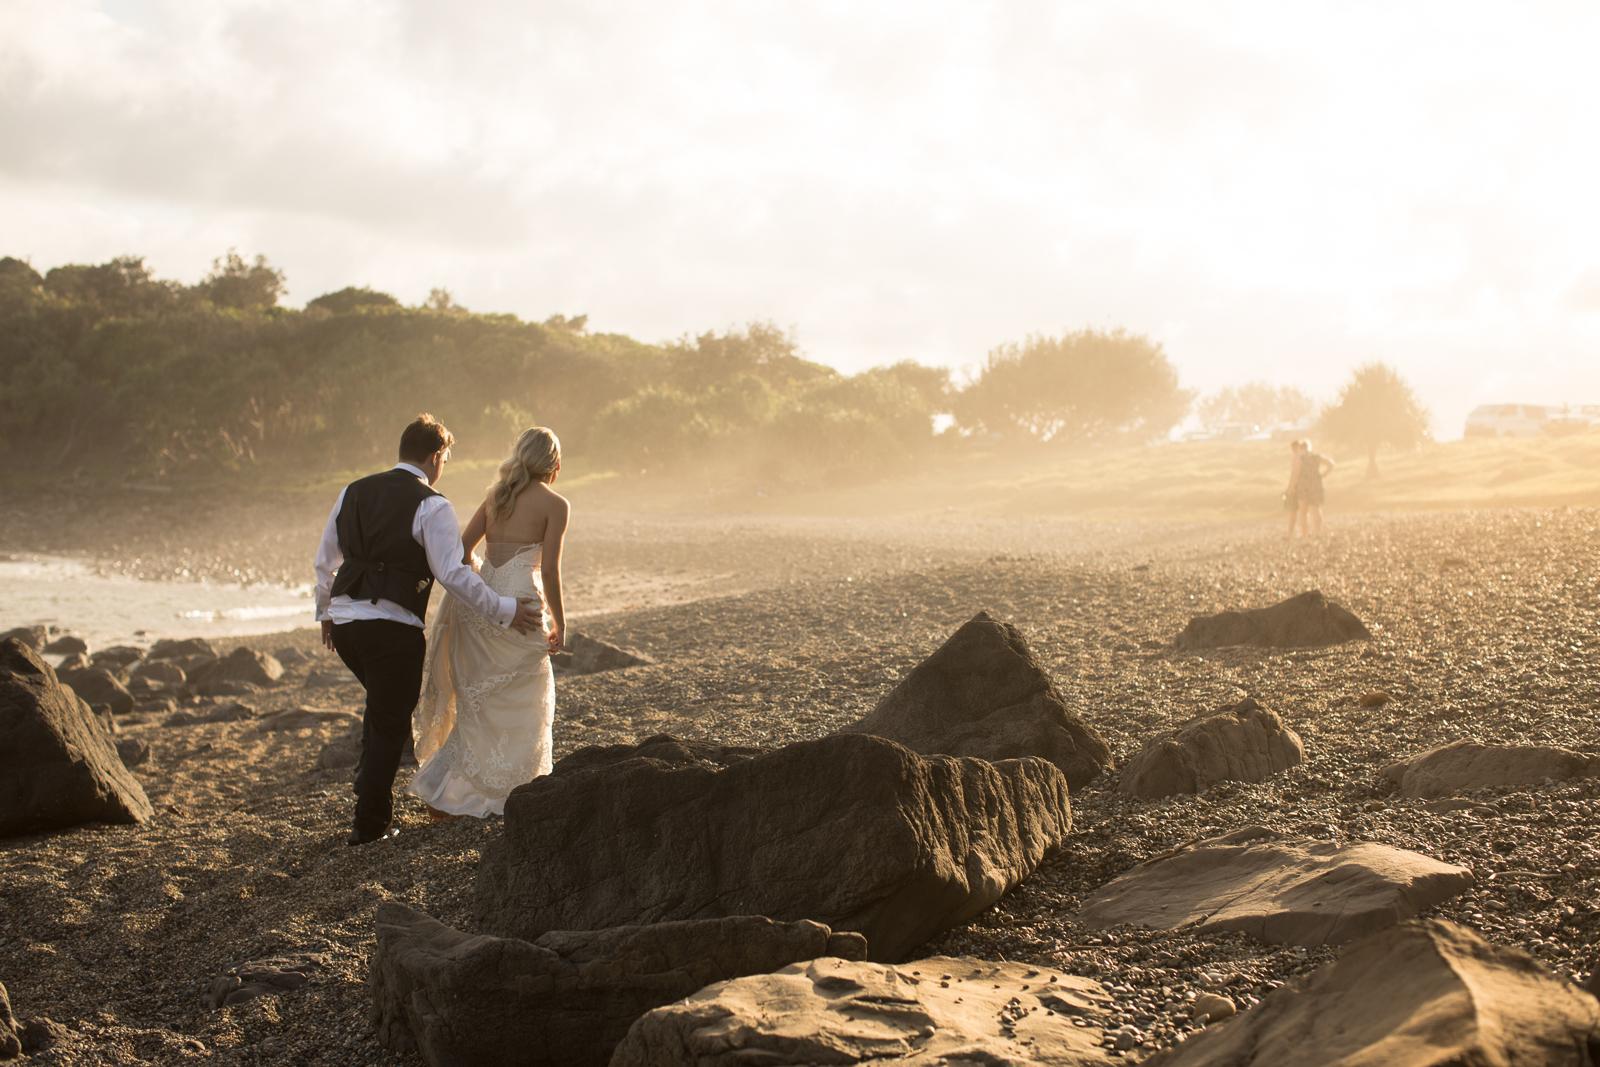 164Bec_Kilpatrick_Photography_Kate_and_Elliot_Ballina_Wedding_Portraits-XXX_994822